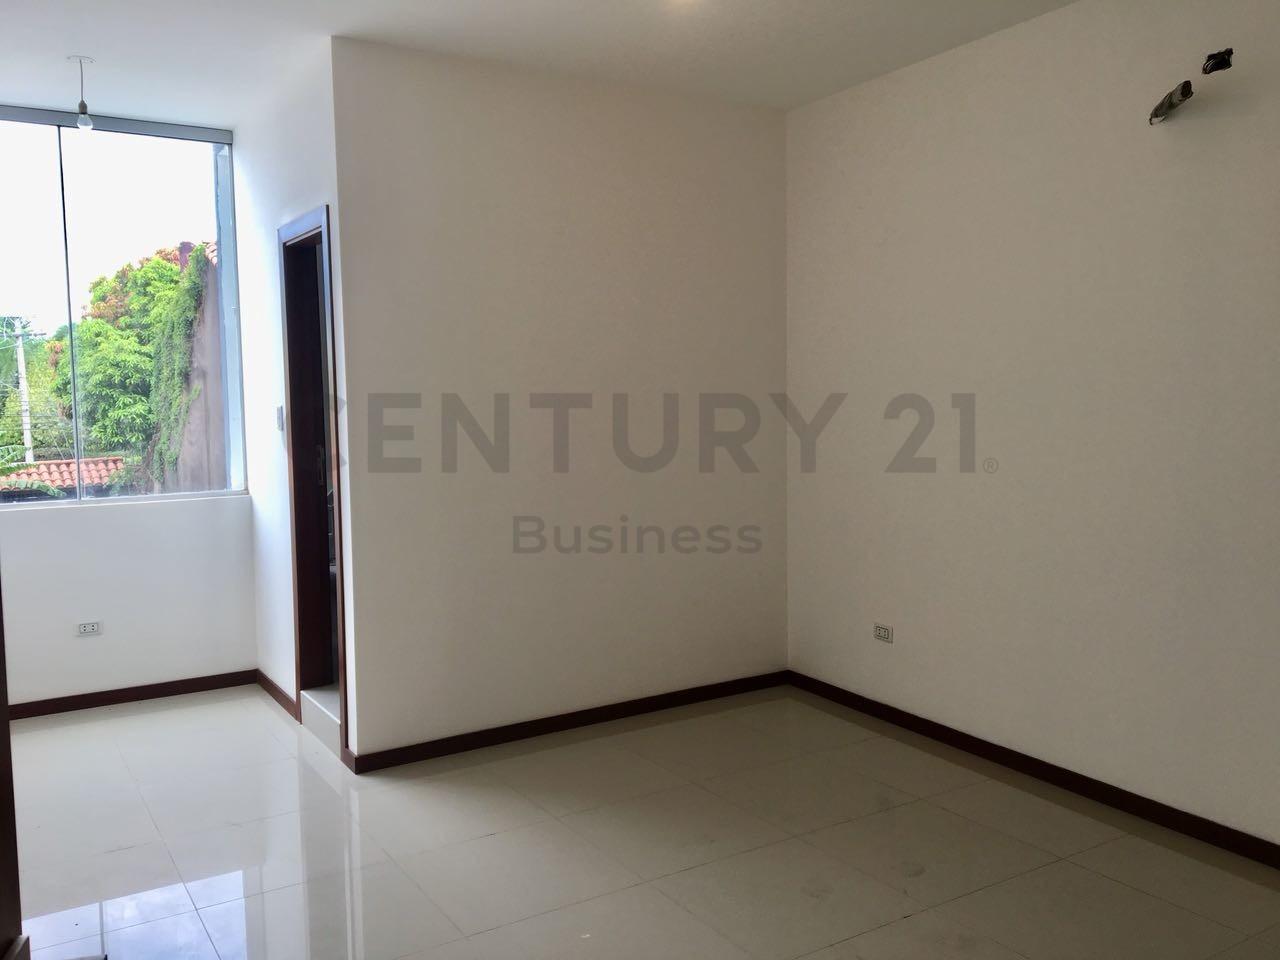 Casa en Venta Dirección: Barrio Hamacas, Avenida Beni Calle Edwin Heath S/N.  Zona:  Municipio: Norte Departamento: Santa Cruz País: Bolivia Foto 8